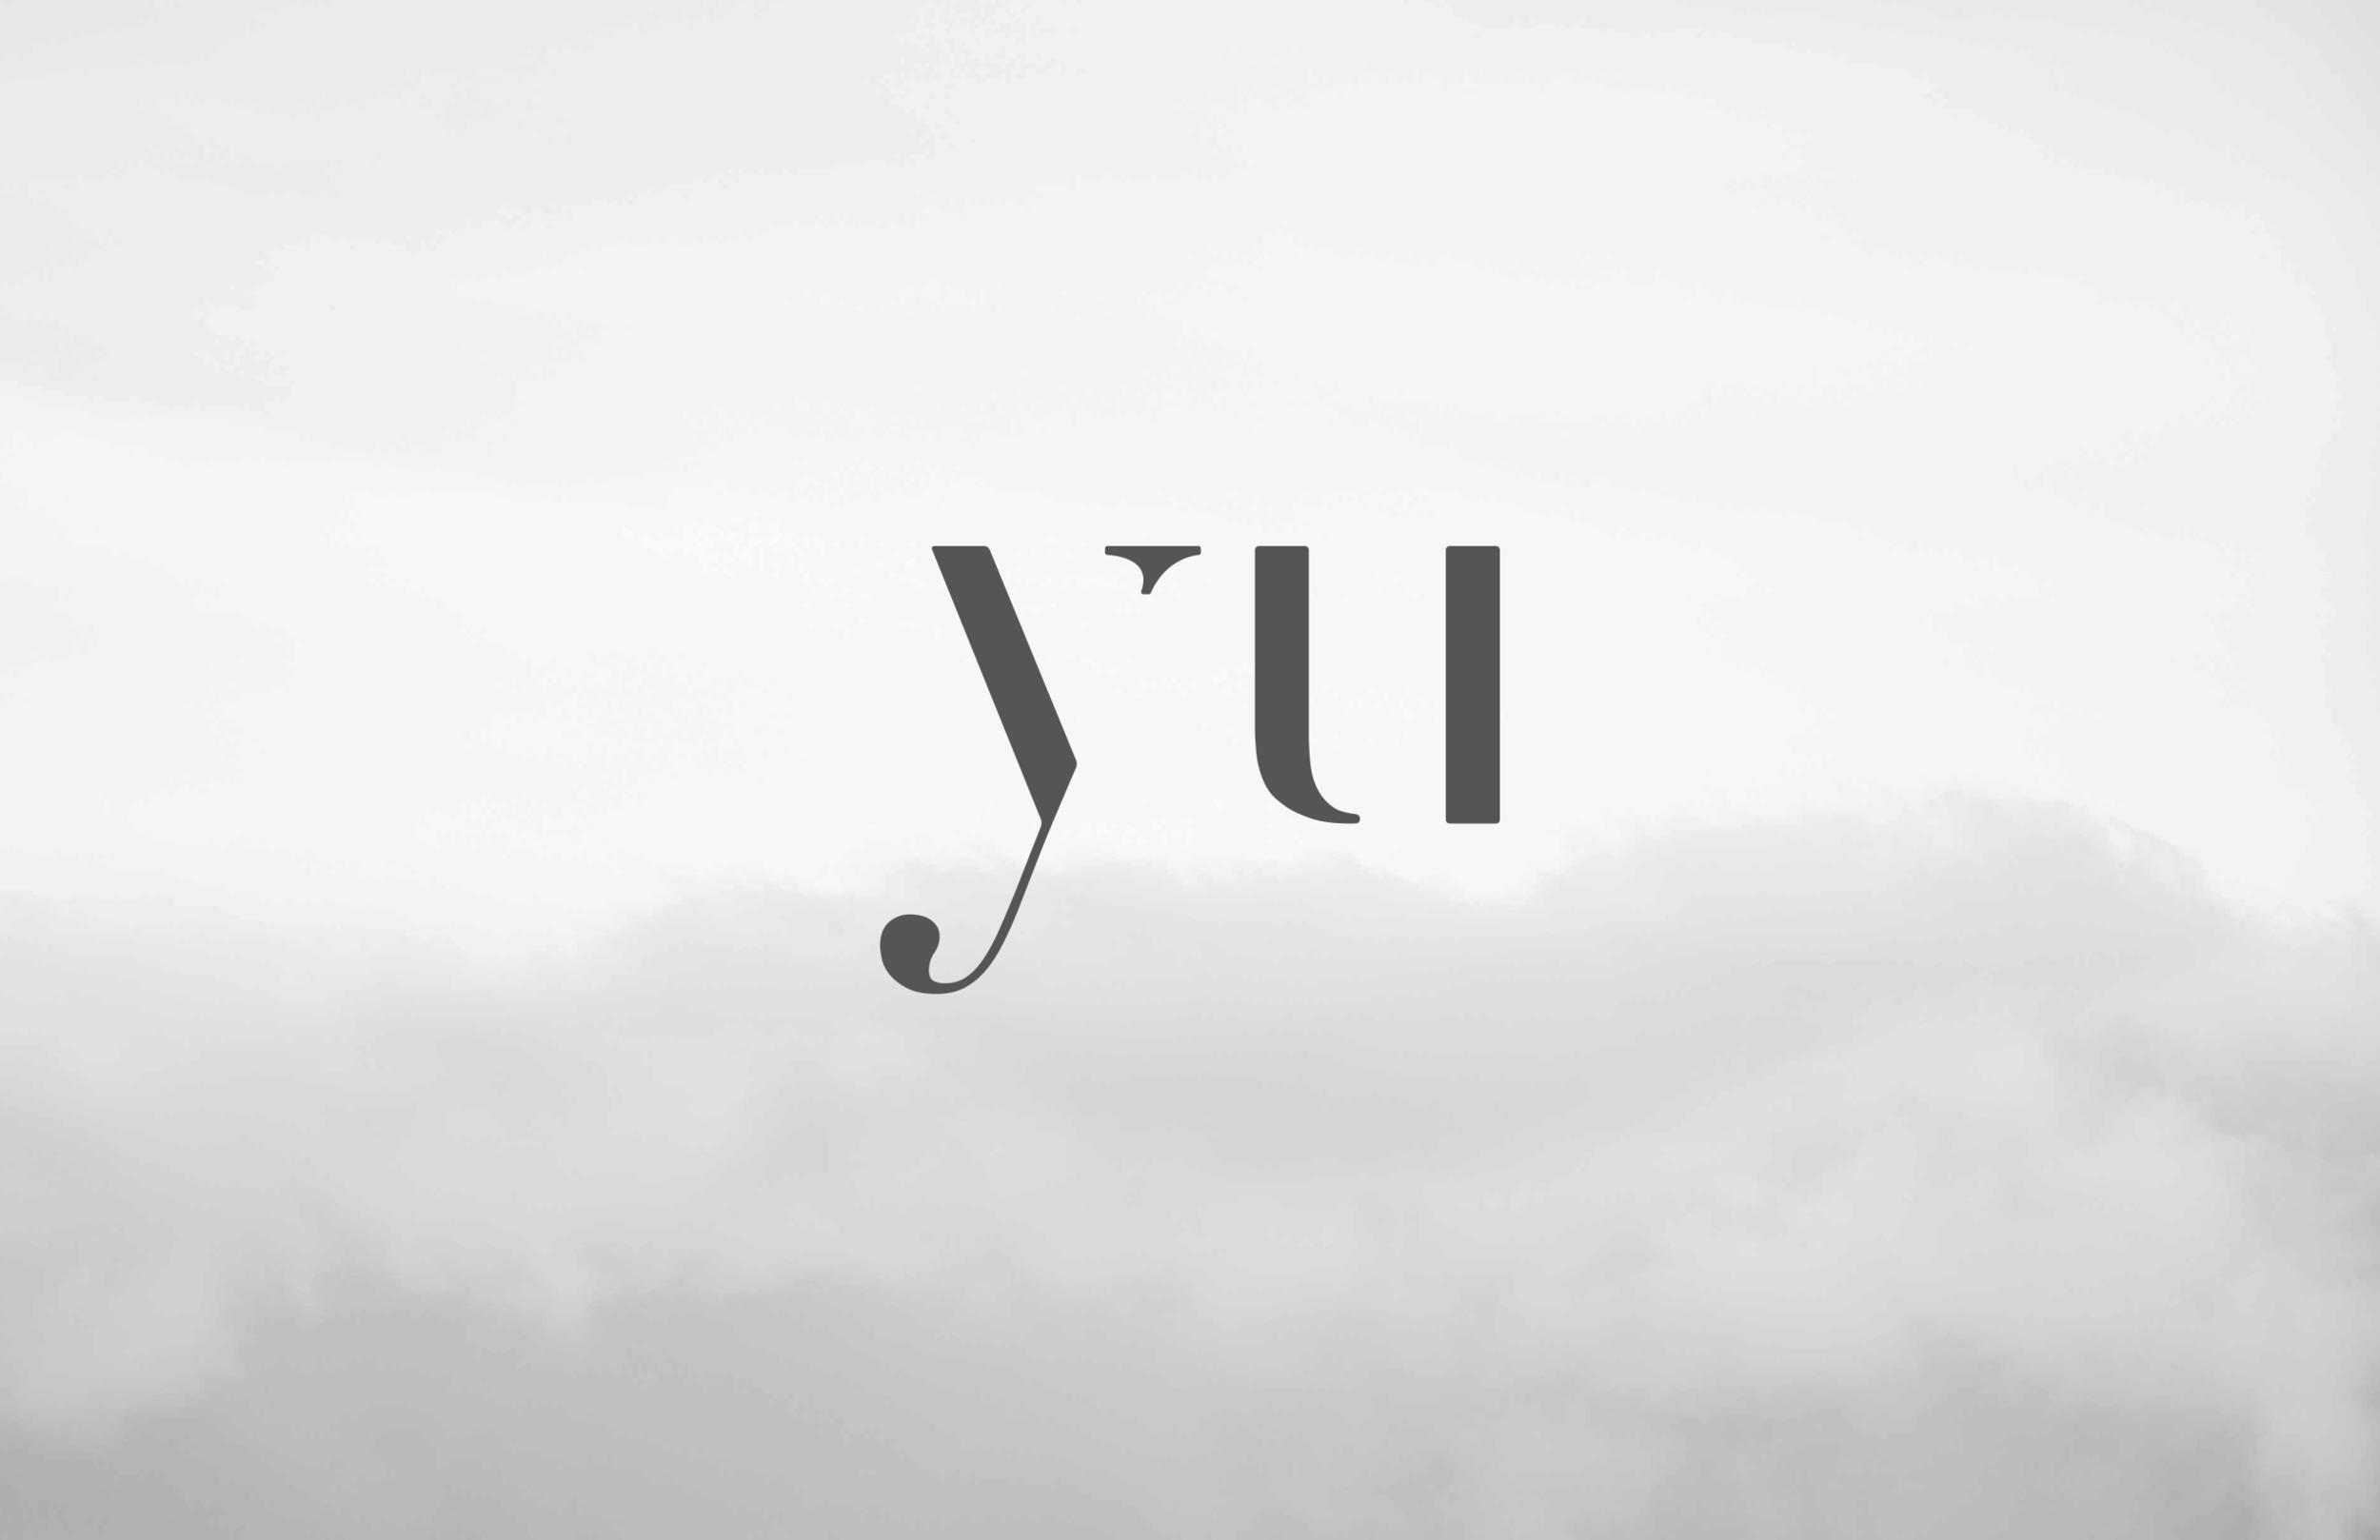 YU-bed-sleep-number-ben-rummel-design.png